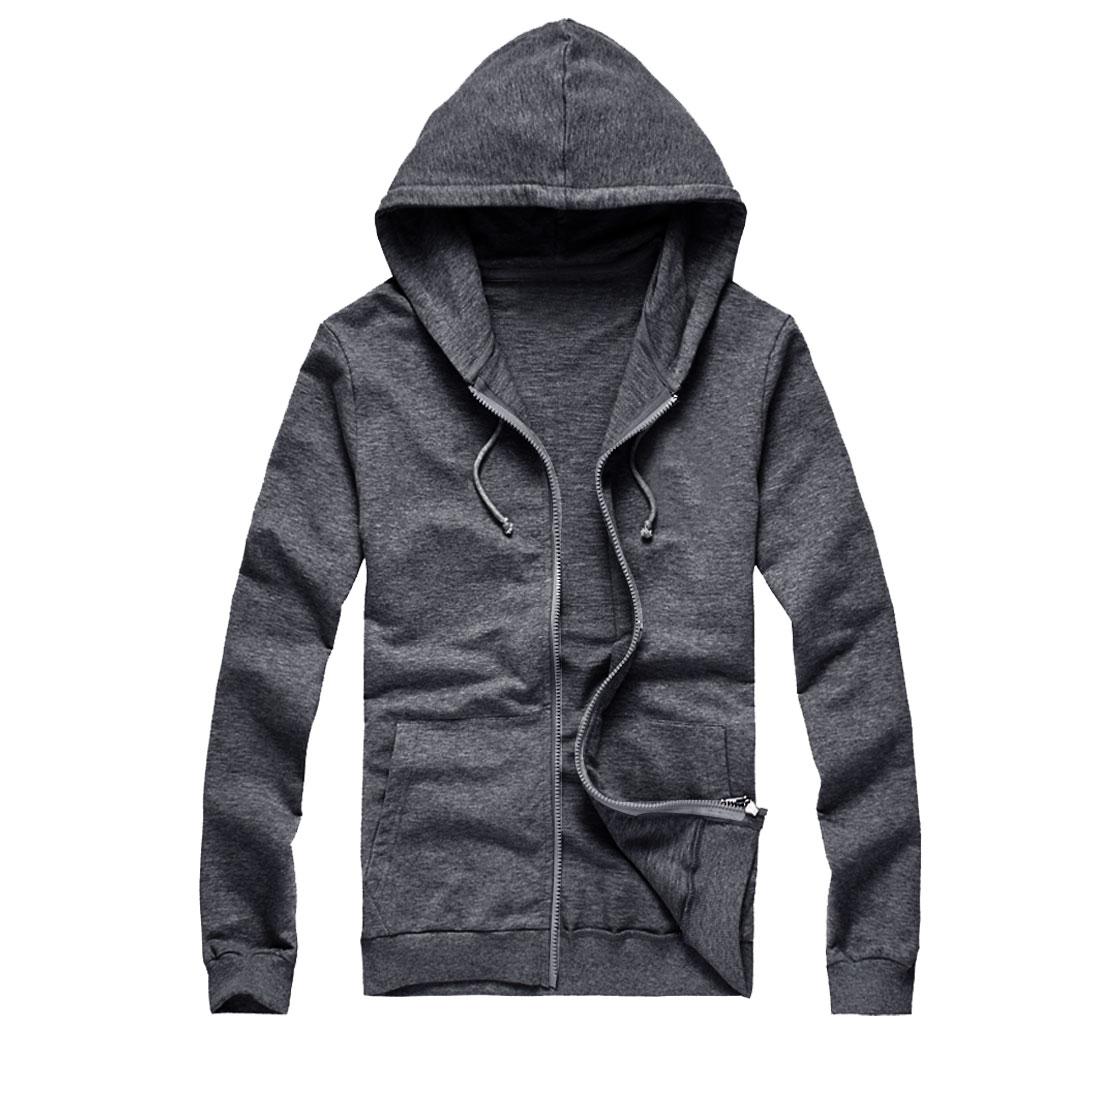 Men Zipper Front Drawstring Slant Pockets Thick Hoody Dark Gray M